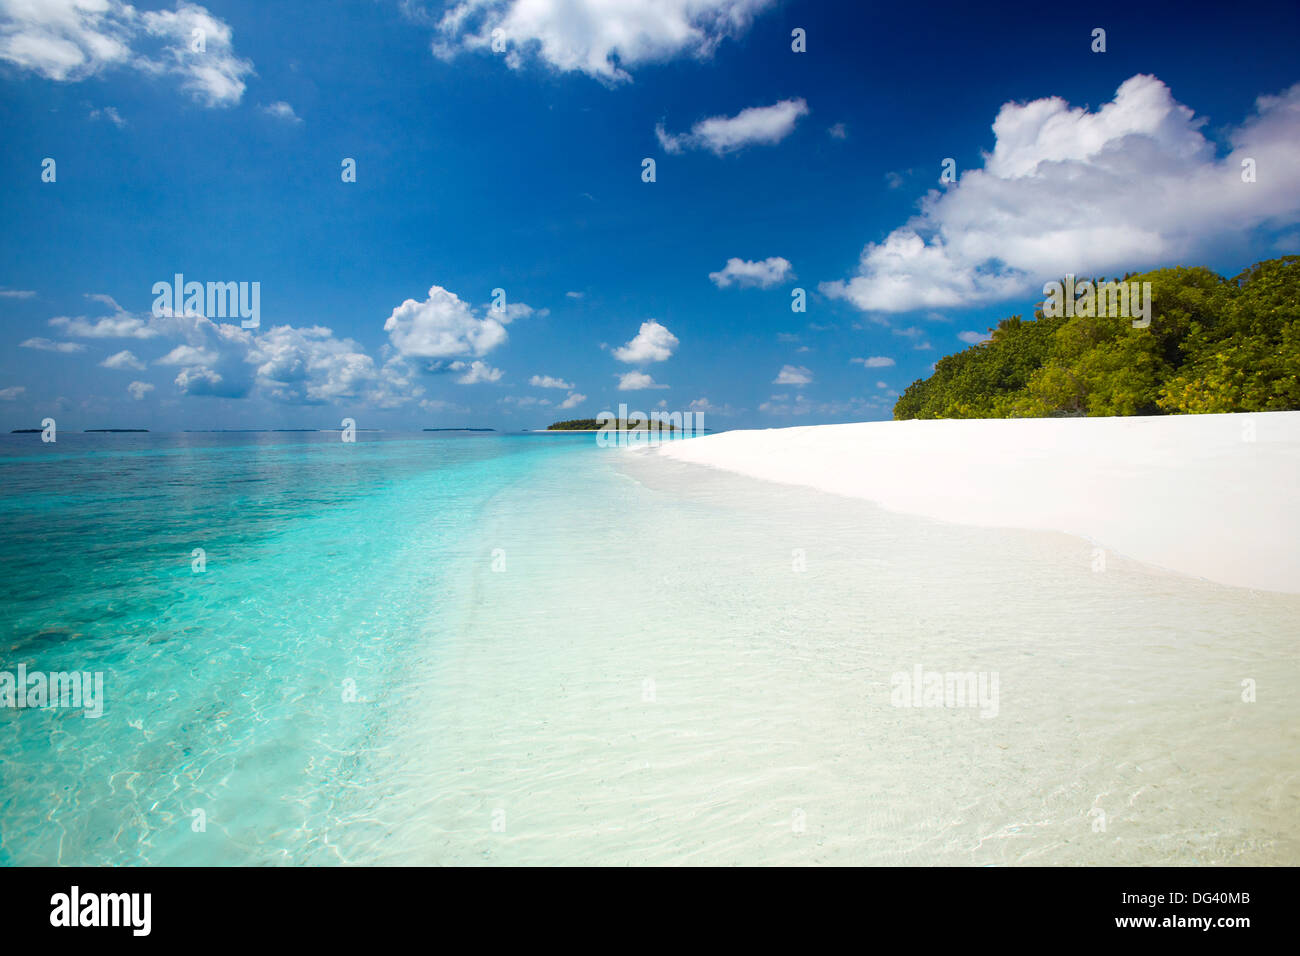 Tropical beach, Baa Atoll, Maldives, Indian Ocean, Asia - Stock Image